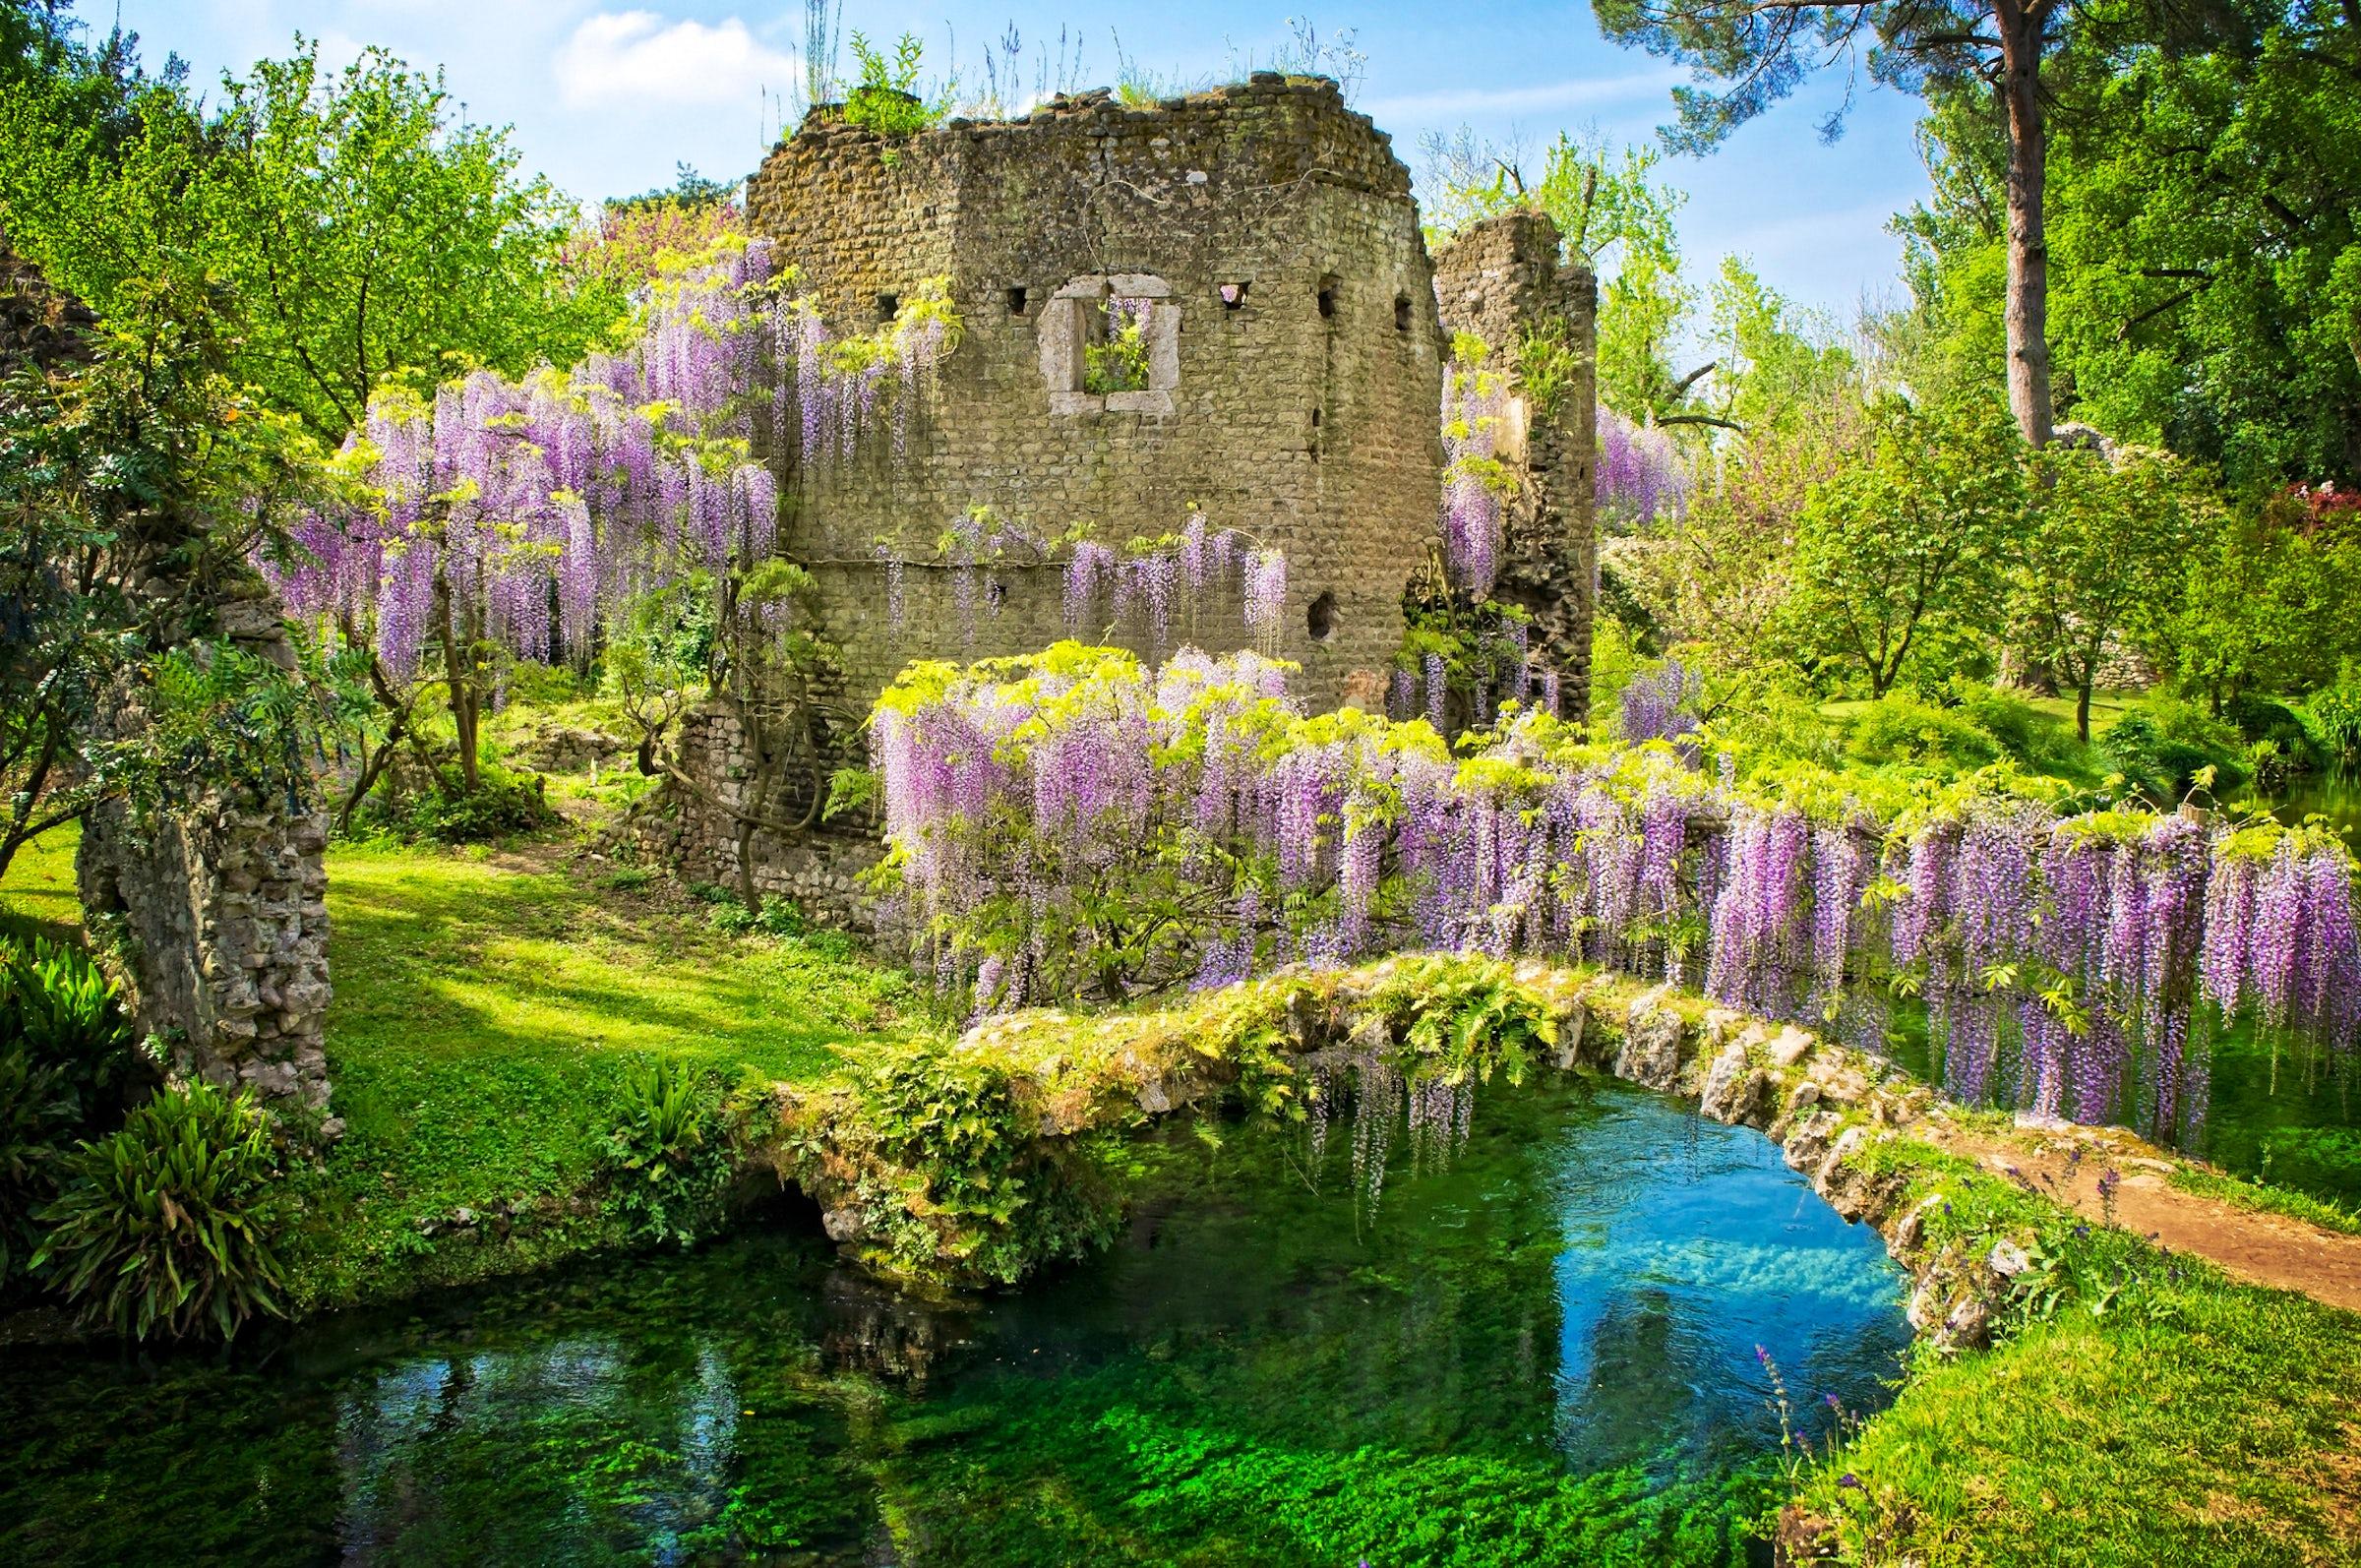 A Magic Garden Il Giardino Di Ninfa Itinari